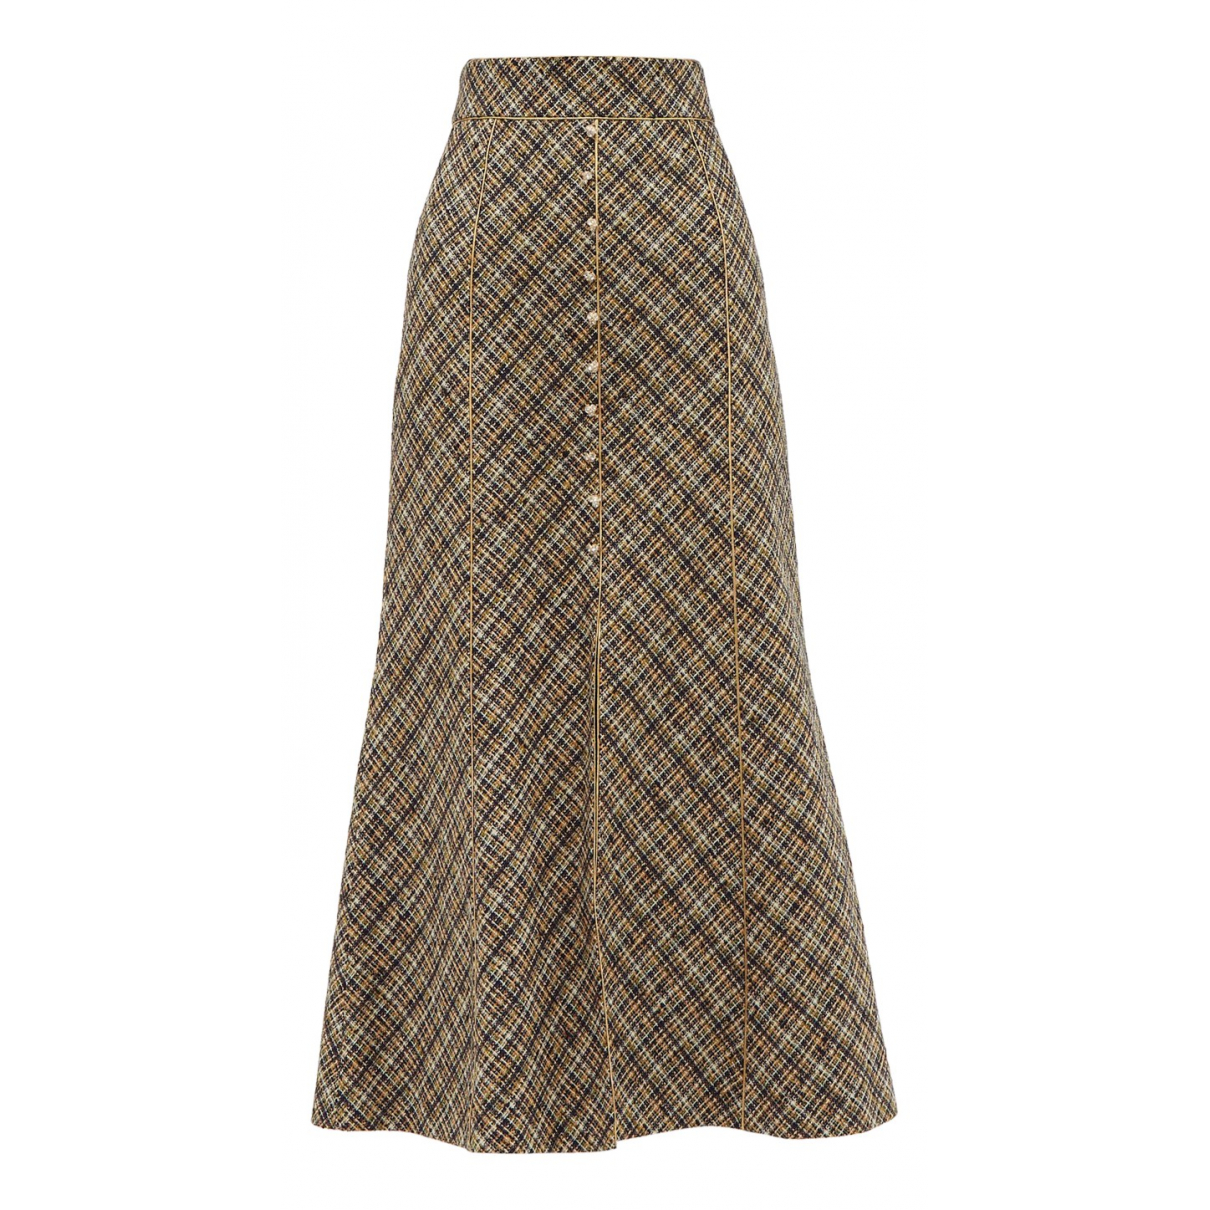 Peter Pilotto N Multicolour Tweed skirt for Women 6 UK